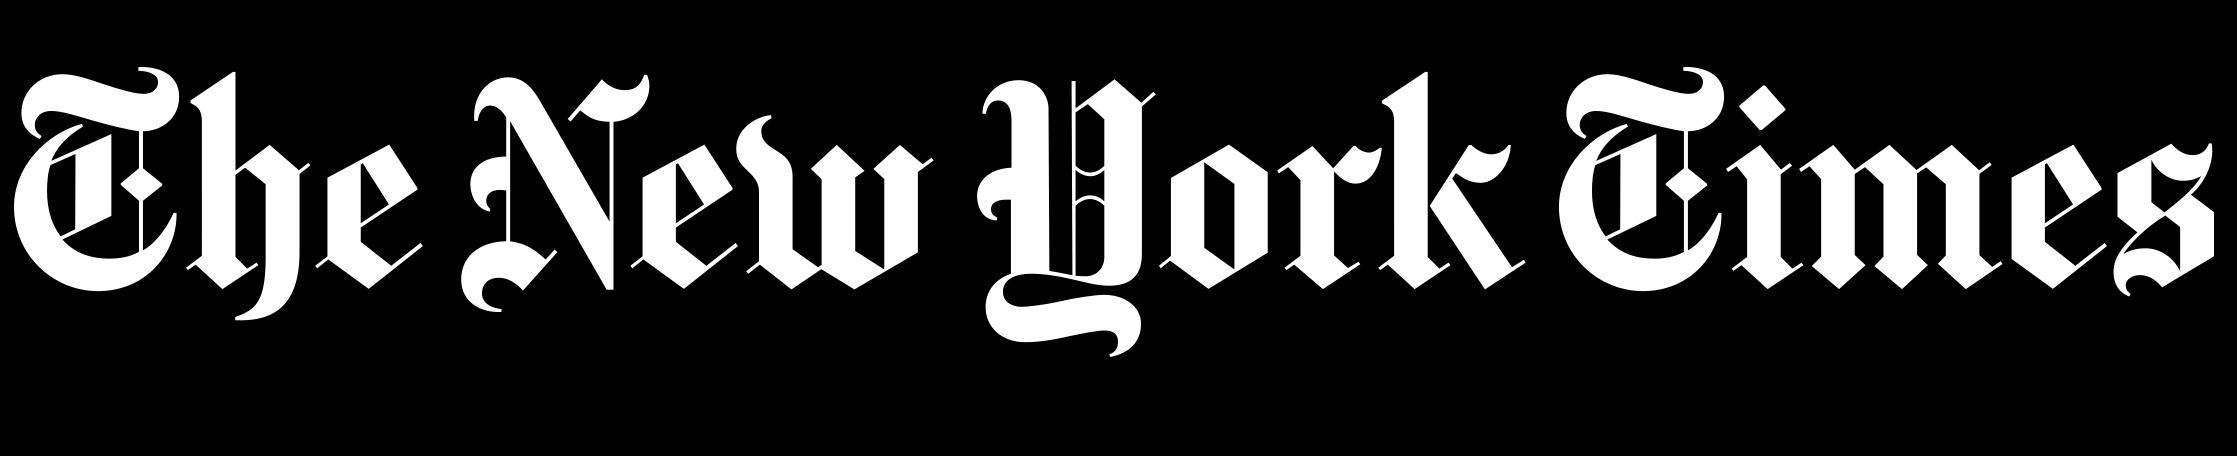 new-york-times-logo-black-and-white.jpg